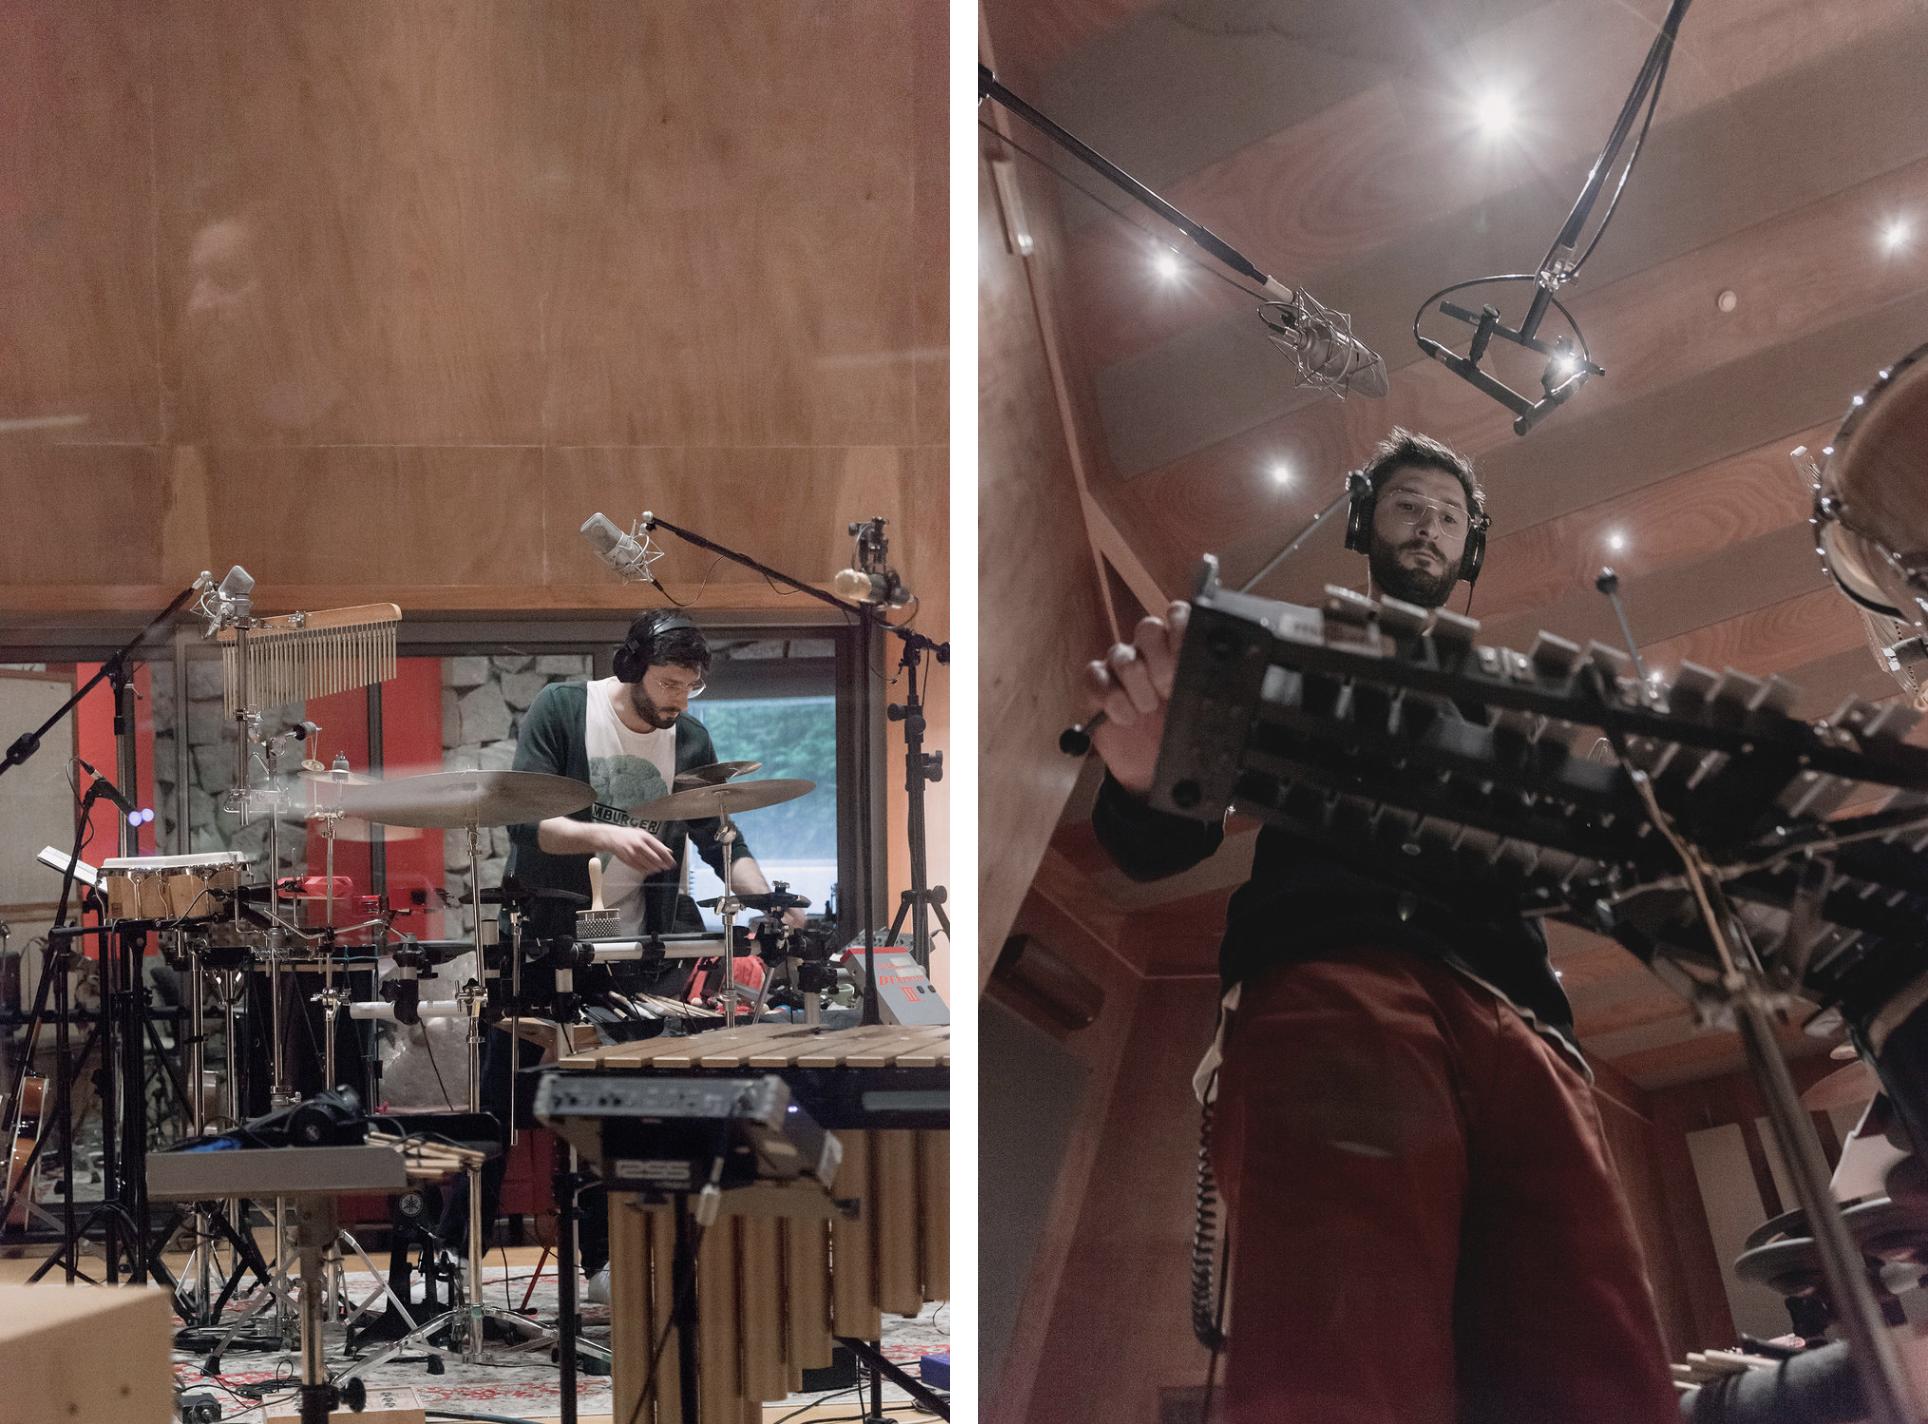 Rui Massena boom studios recording III bonjourmolotov Andre Gigante Photography 06.png